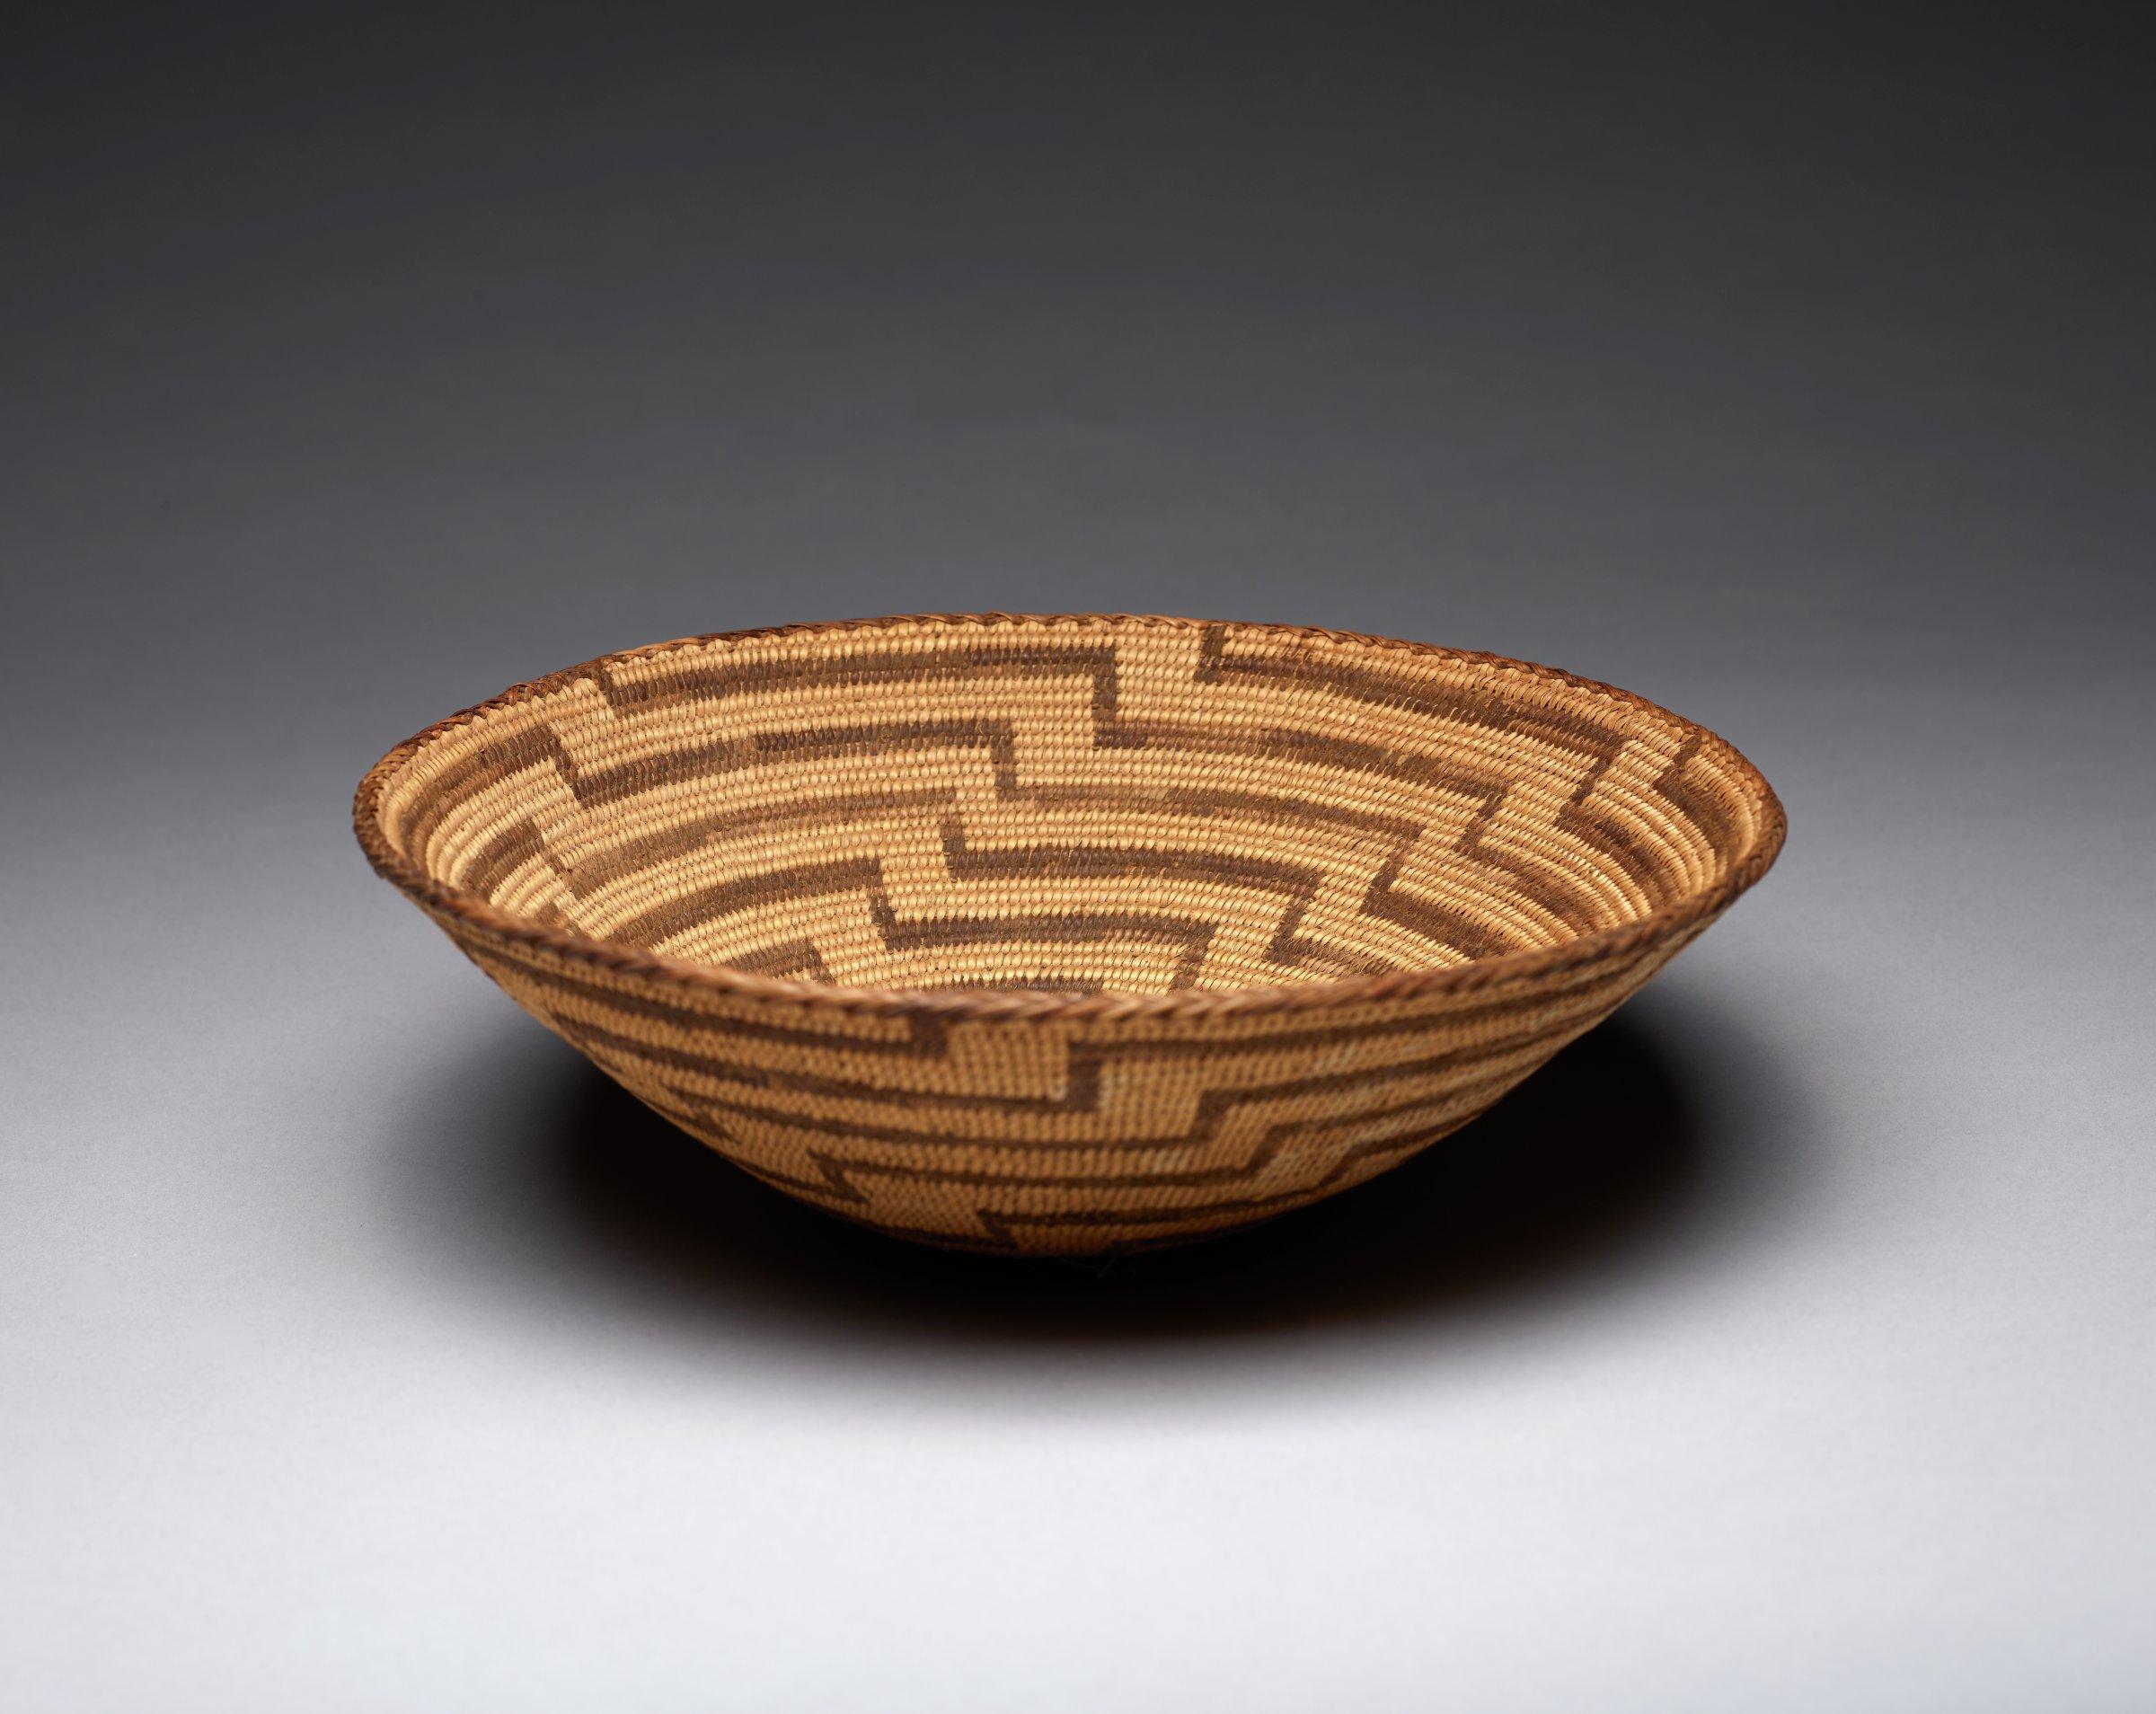 Basket, Apache people, Pima people, Native American, grass fibers and vegetal dye